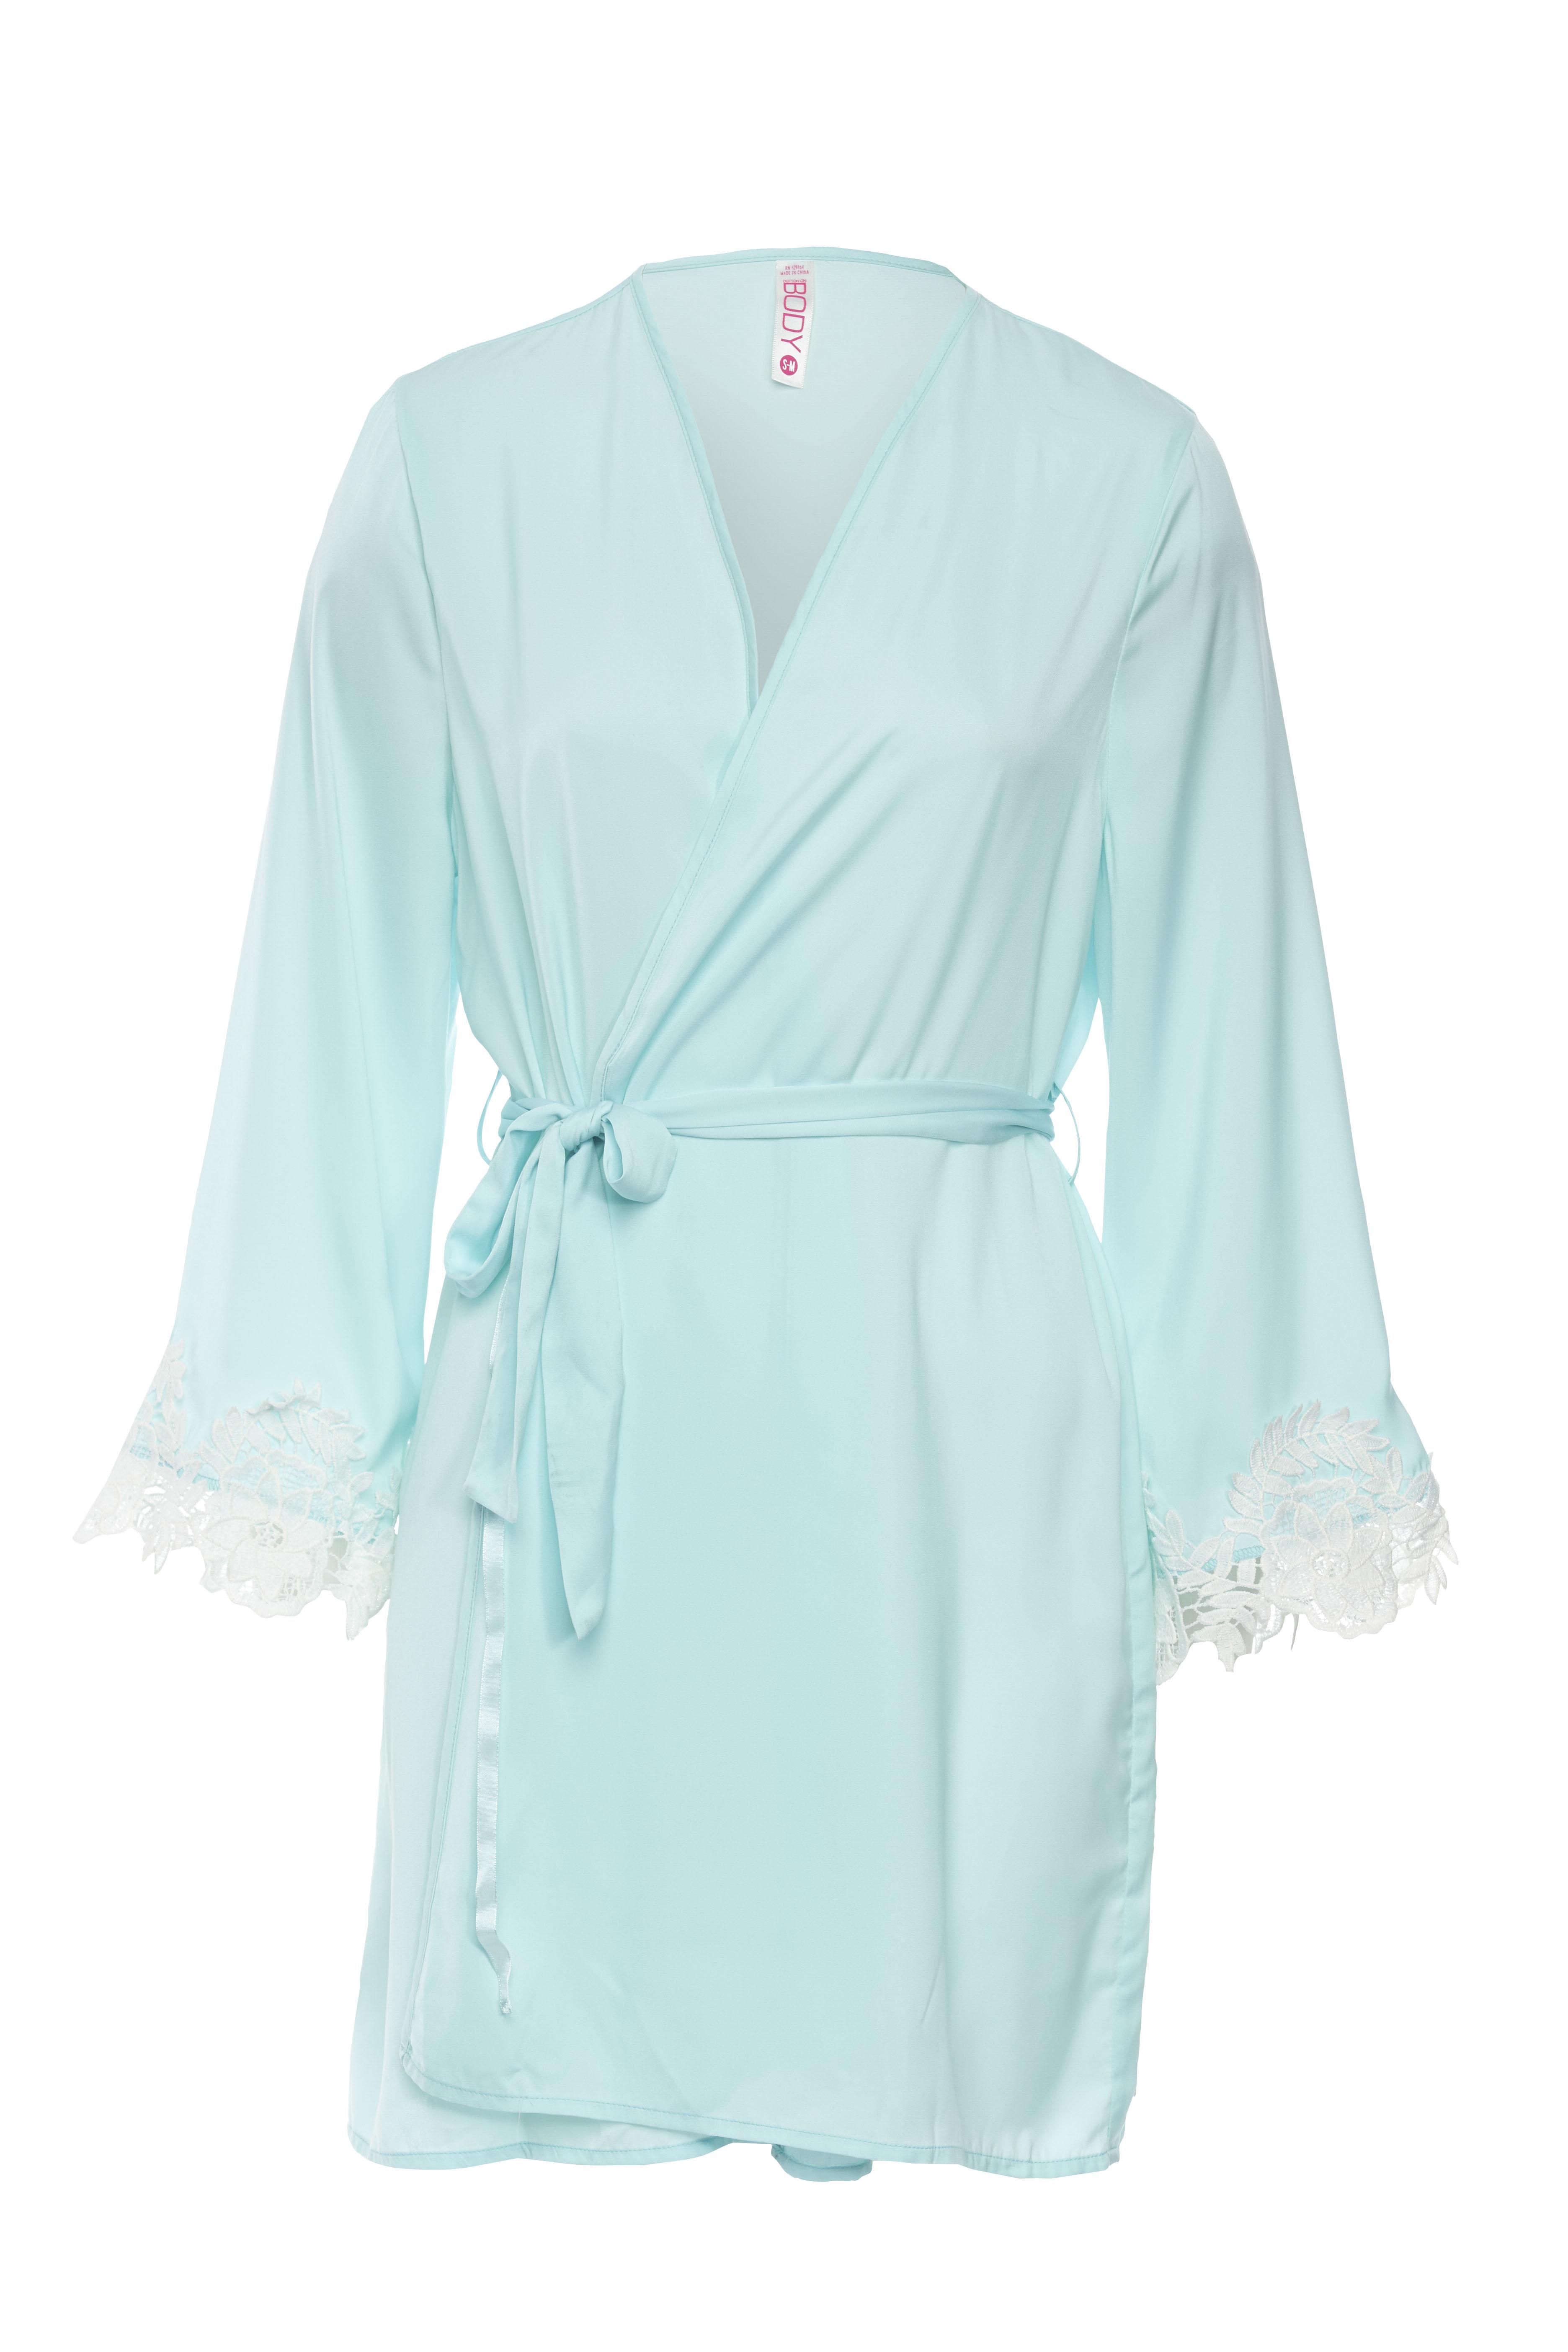 cotton-on-body_talia-gown_nz39-95-sept-dec-2